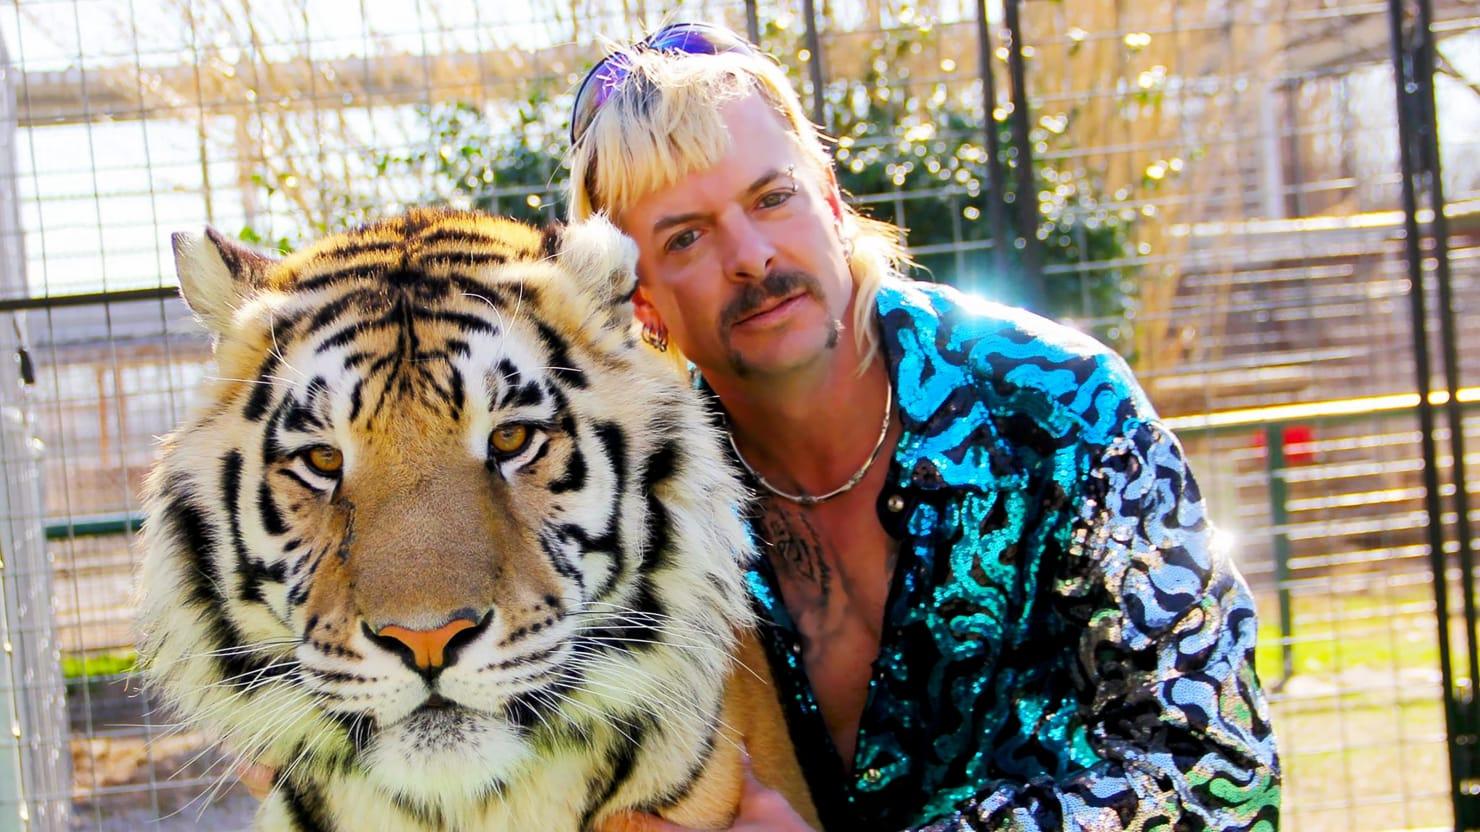 Joe Exotic From Tiger King Is in Coronavirus...